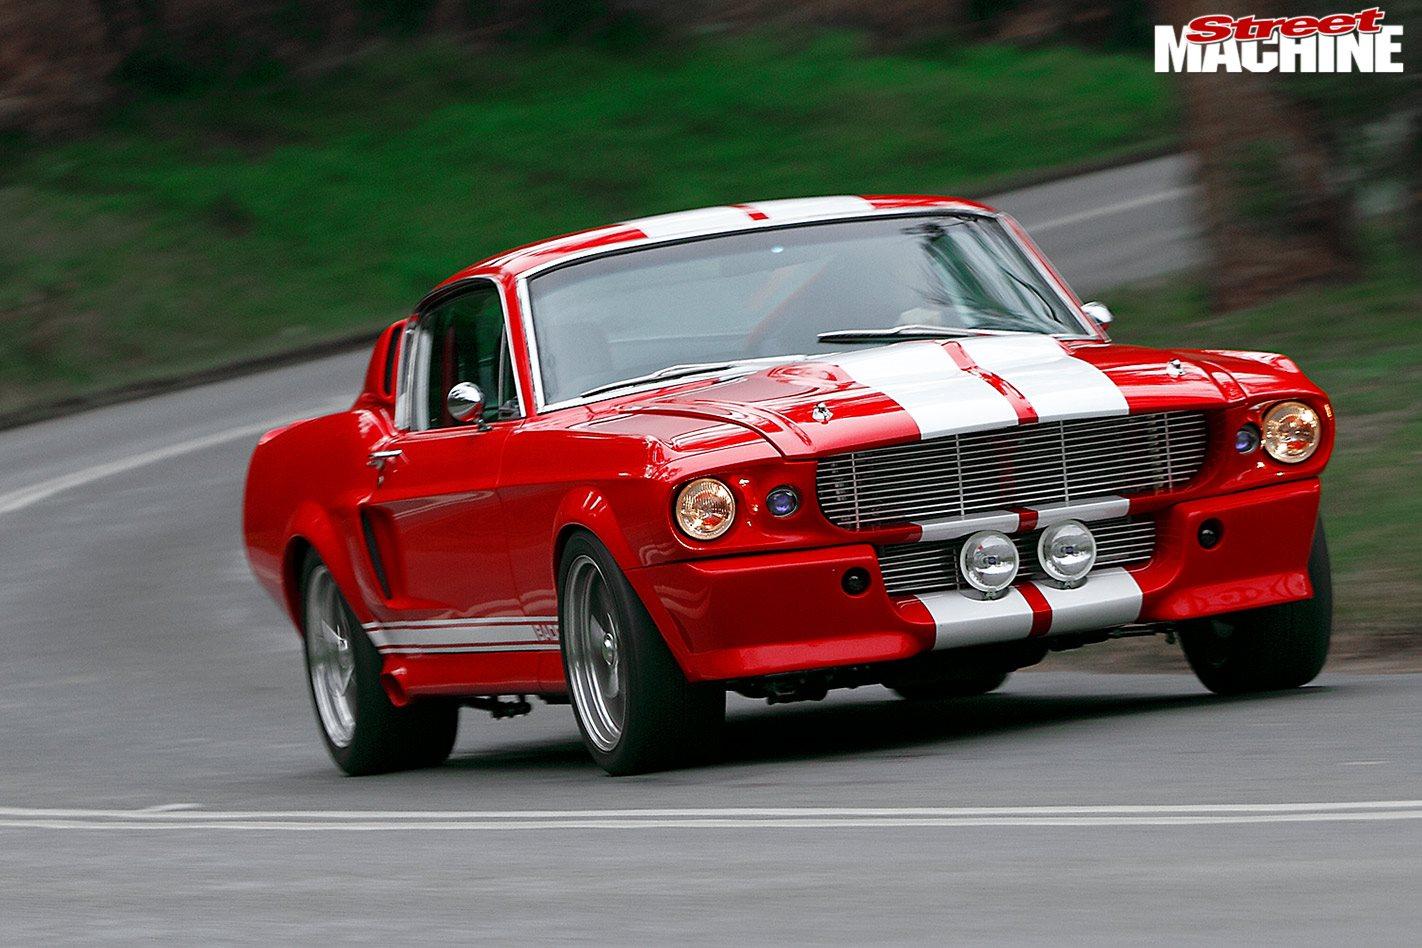 Pro Golfer Aaron Baddeley S 1968 Ford Mustang Flashback